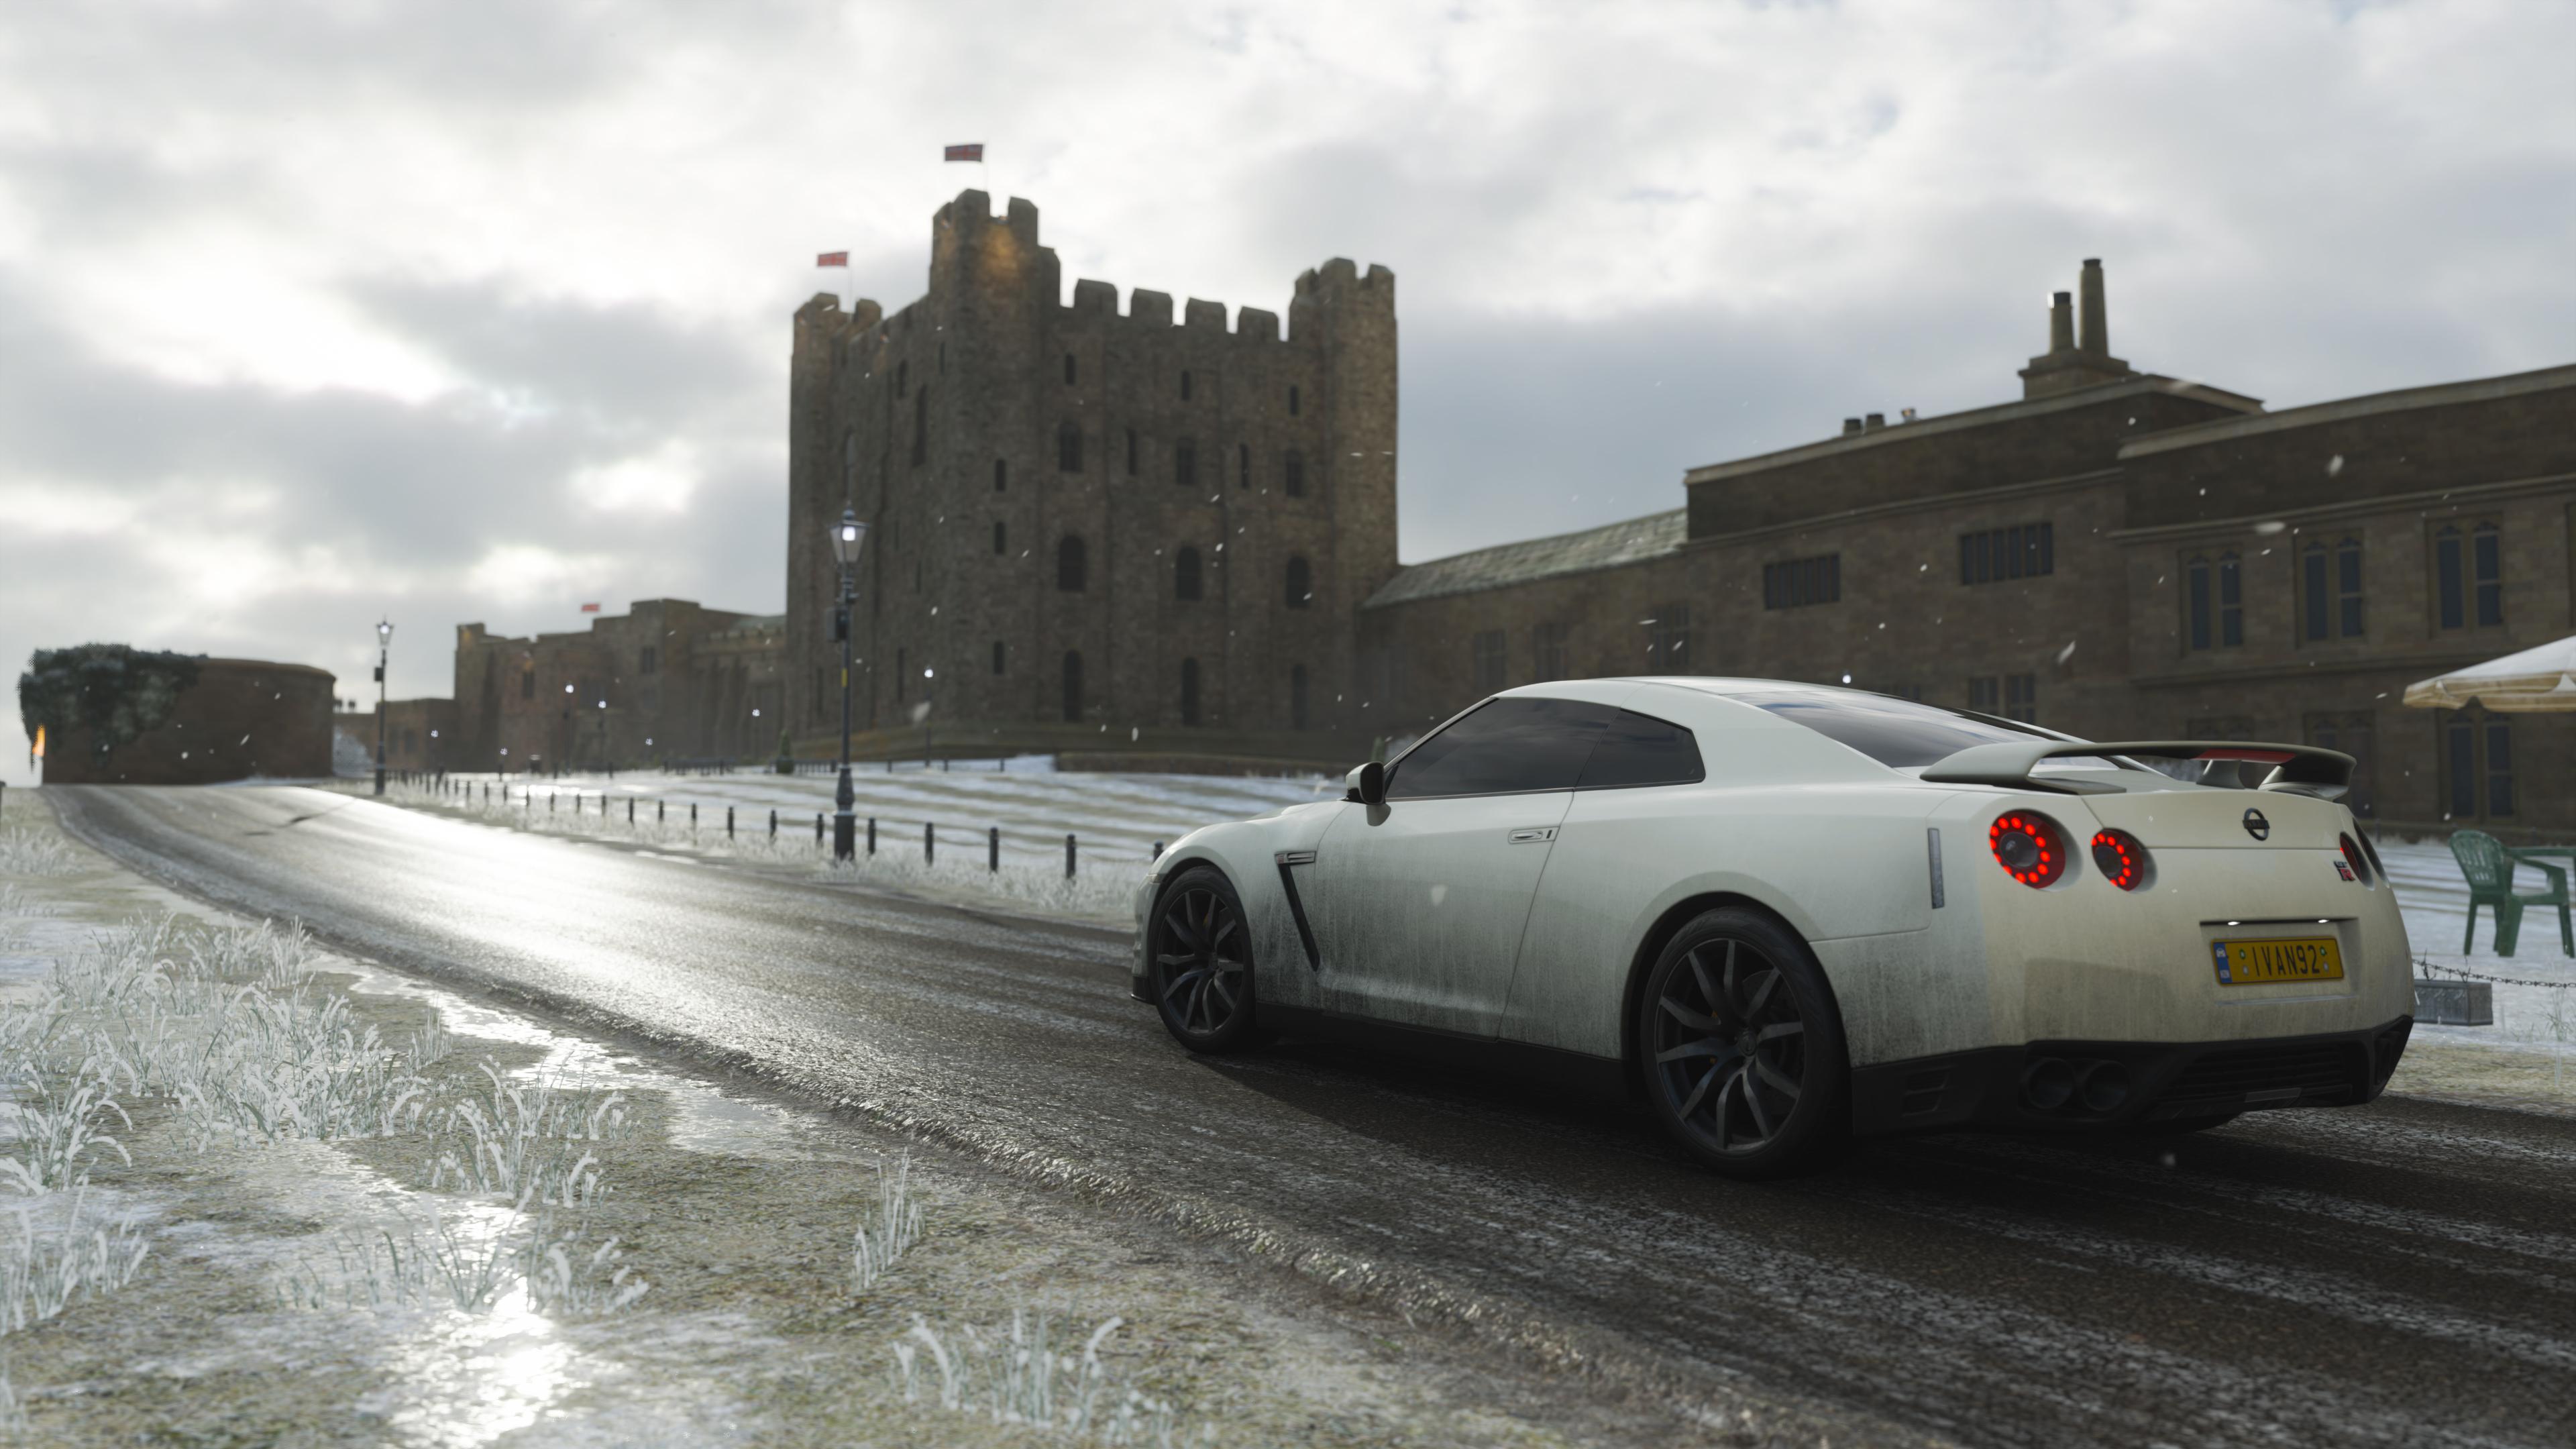 Nissan Gtr Forza Horizon 4k Hd Games 4k Wallpapers Images